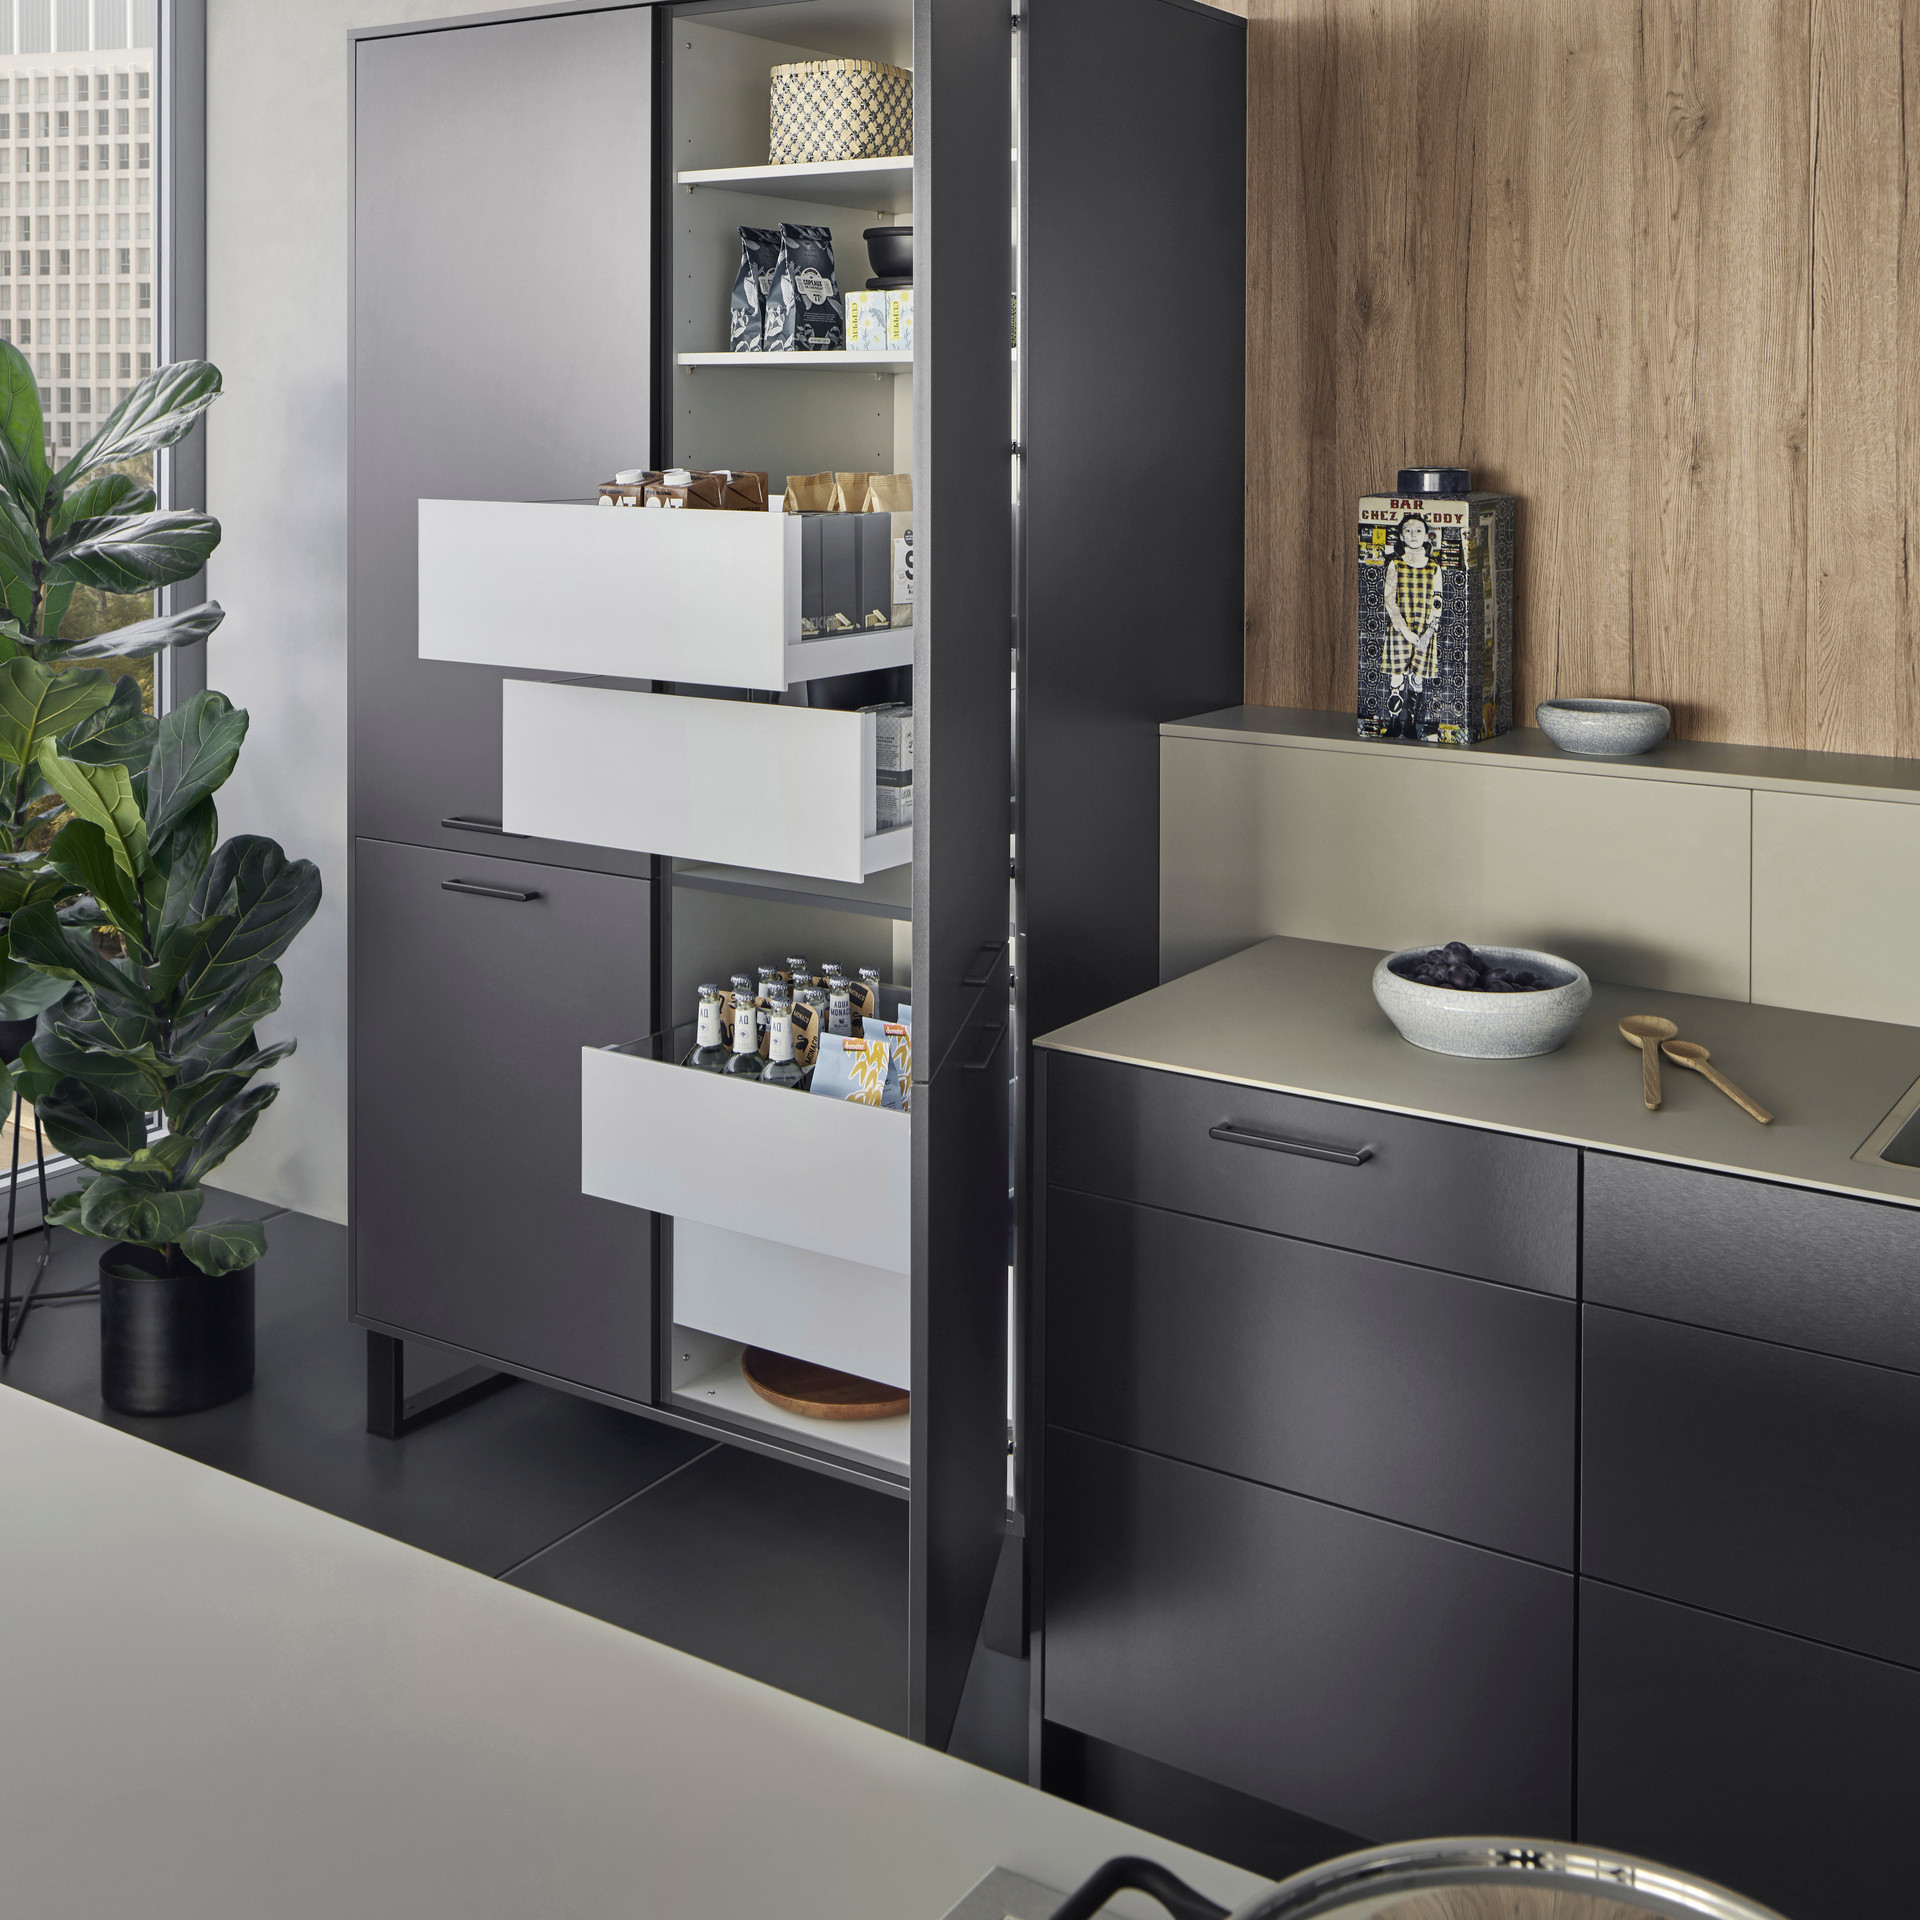 Leicht Metea metallic finish pantry